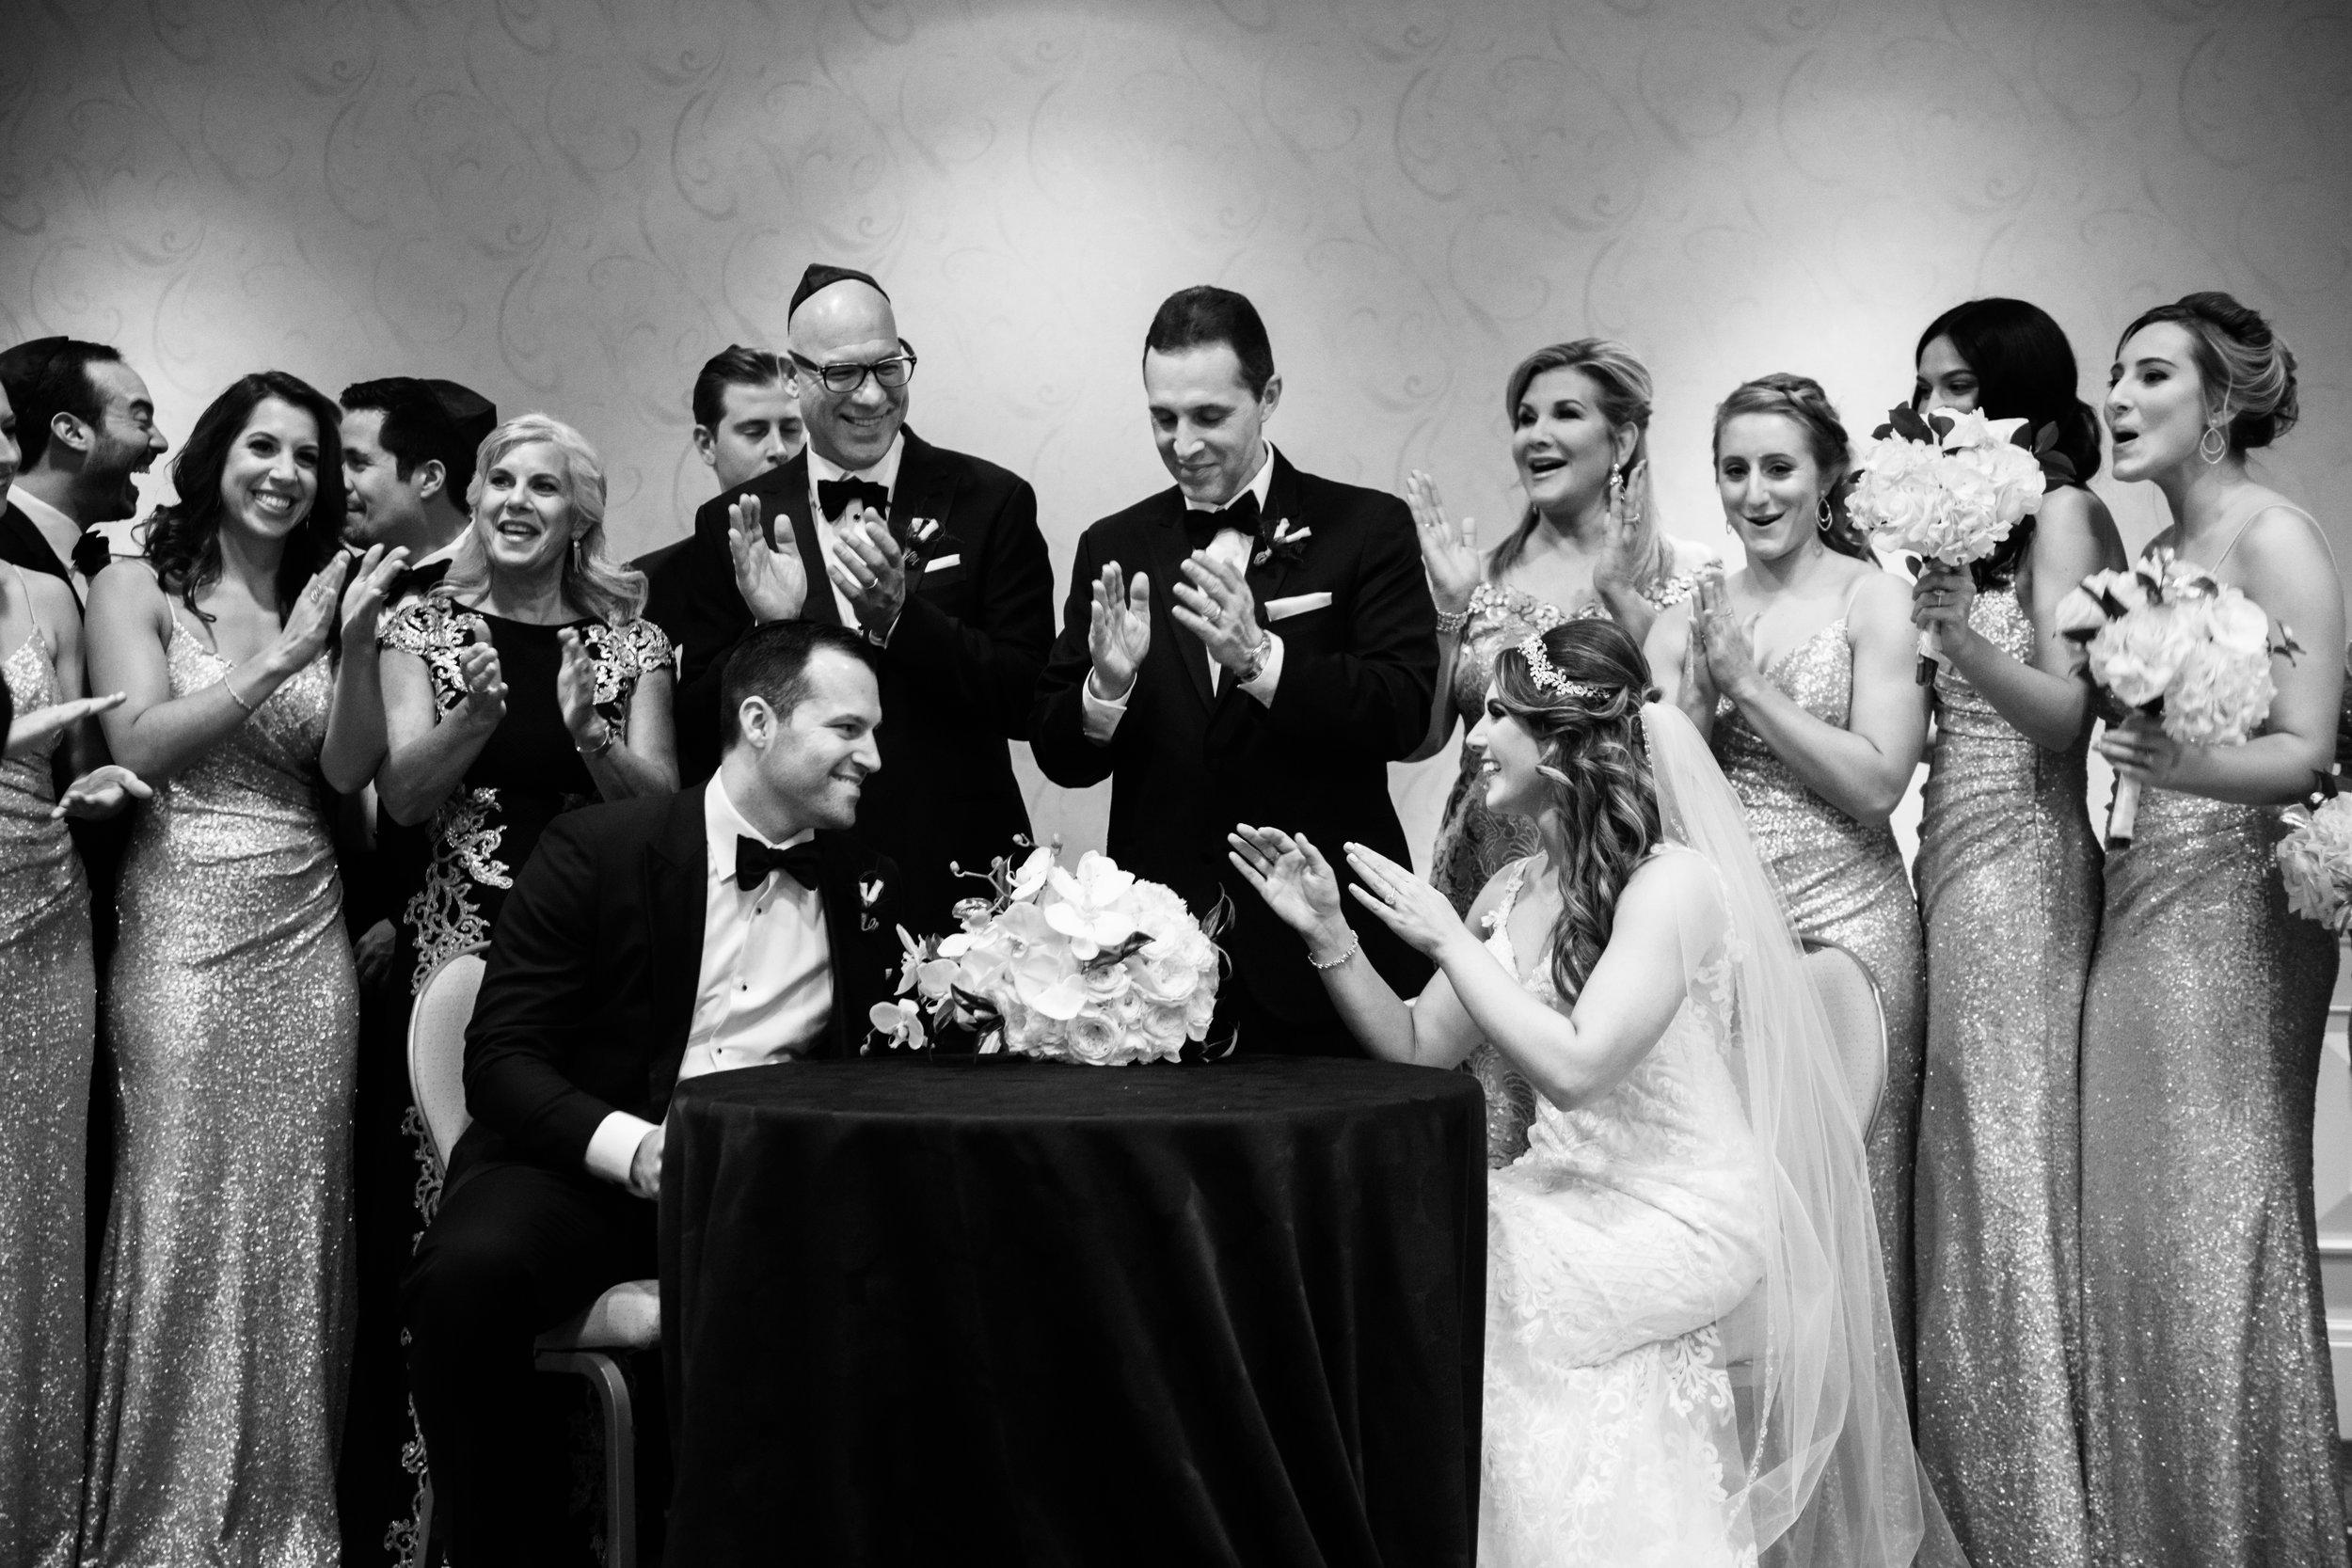 Elegant wedding at the JW Marriott Chicago16.jpg